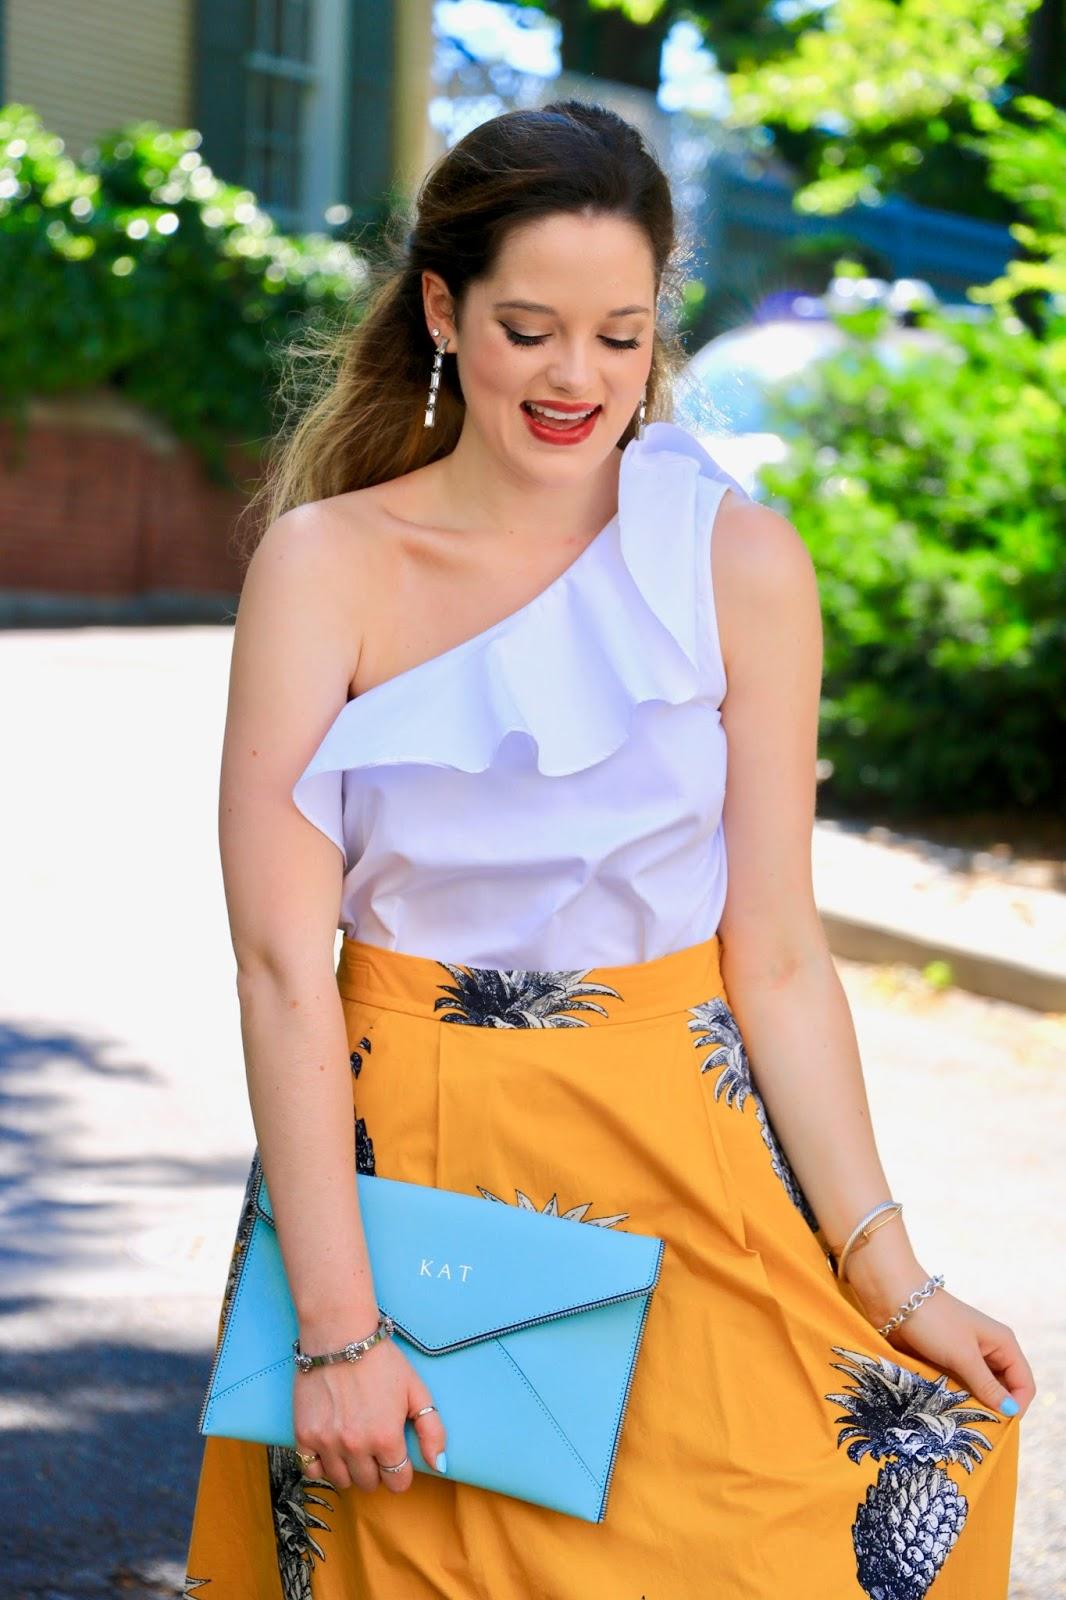 nyc fashion blogger Kathleen Harper wearing an ann taylor one-shoulder ruffle top